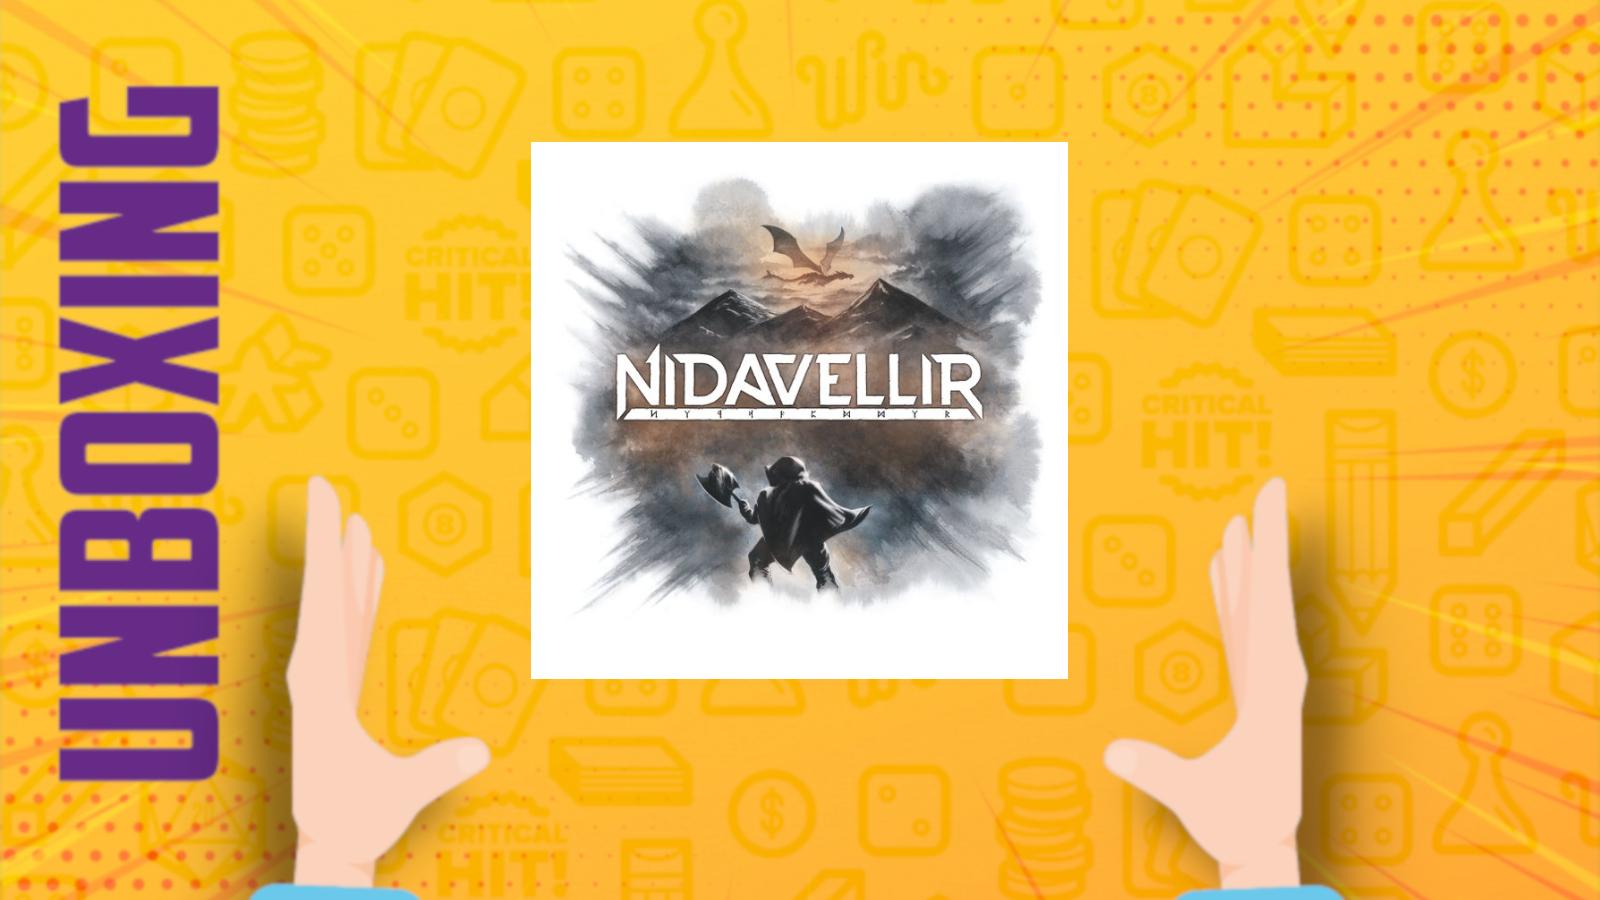 Nidavellir – Unboxing